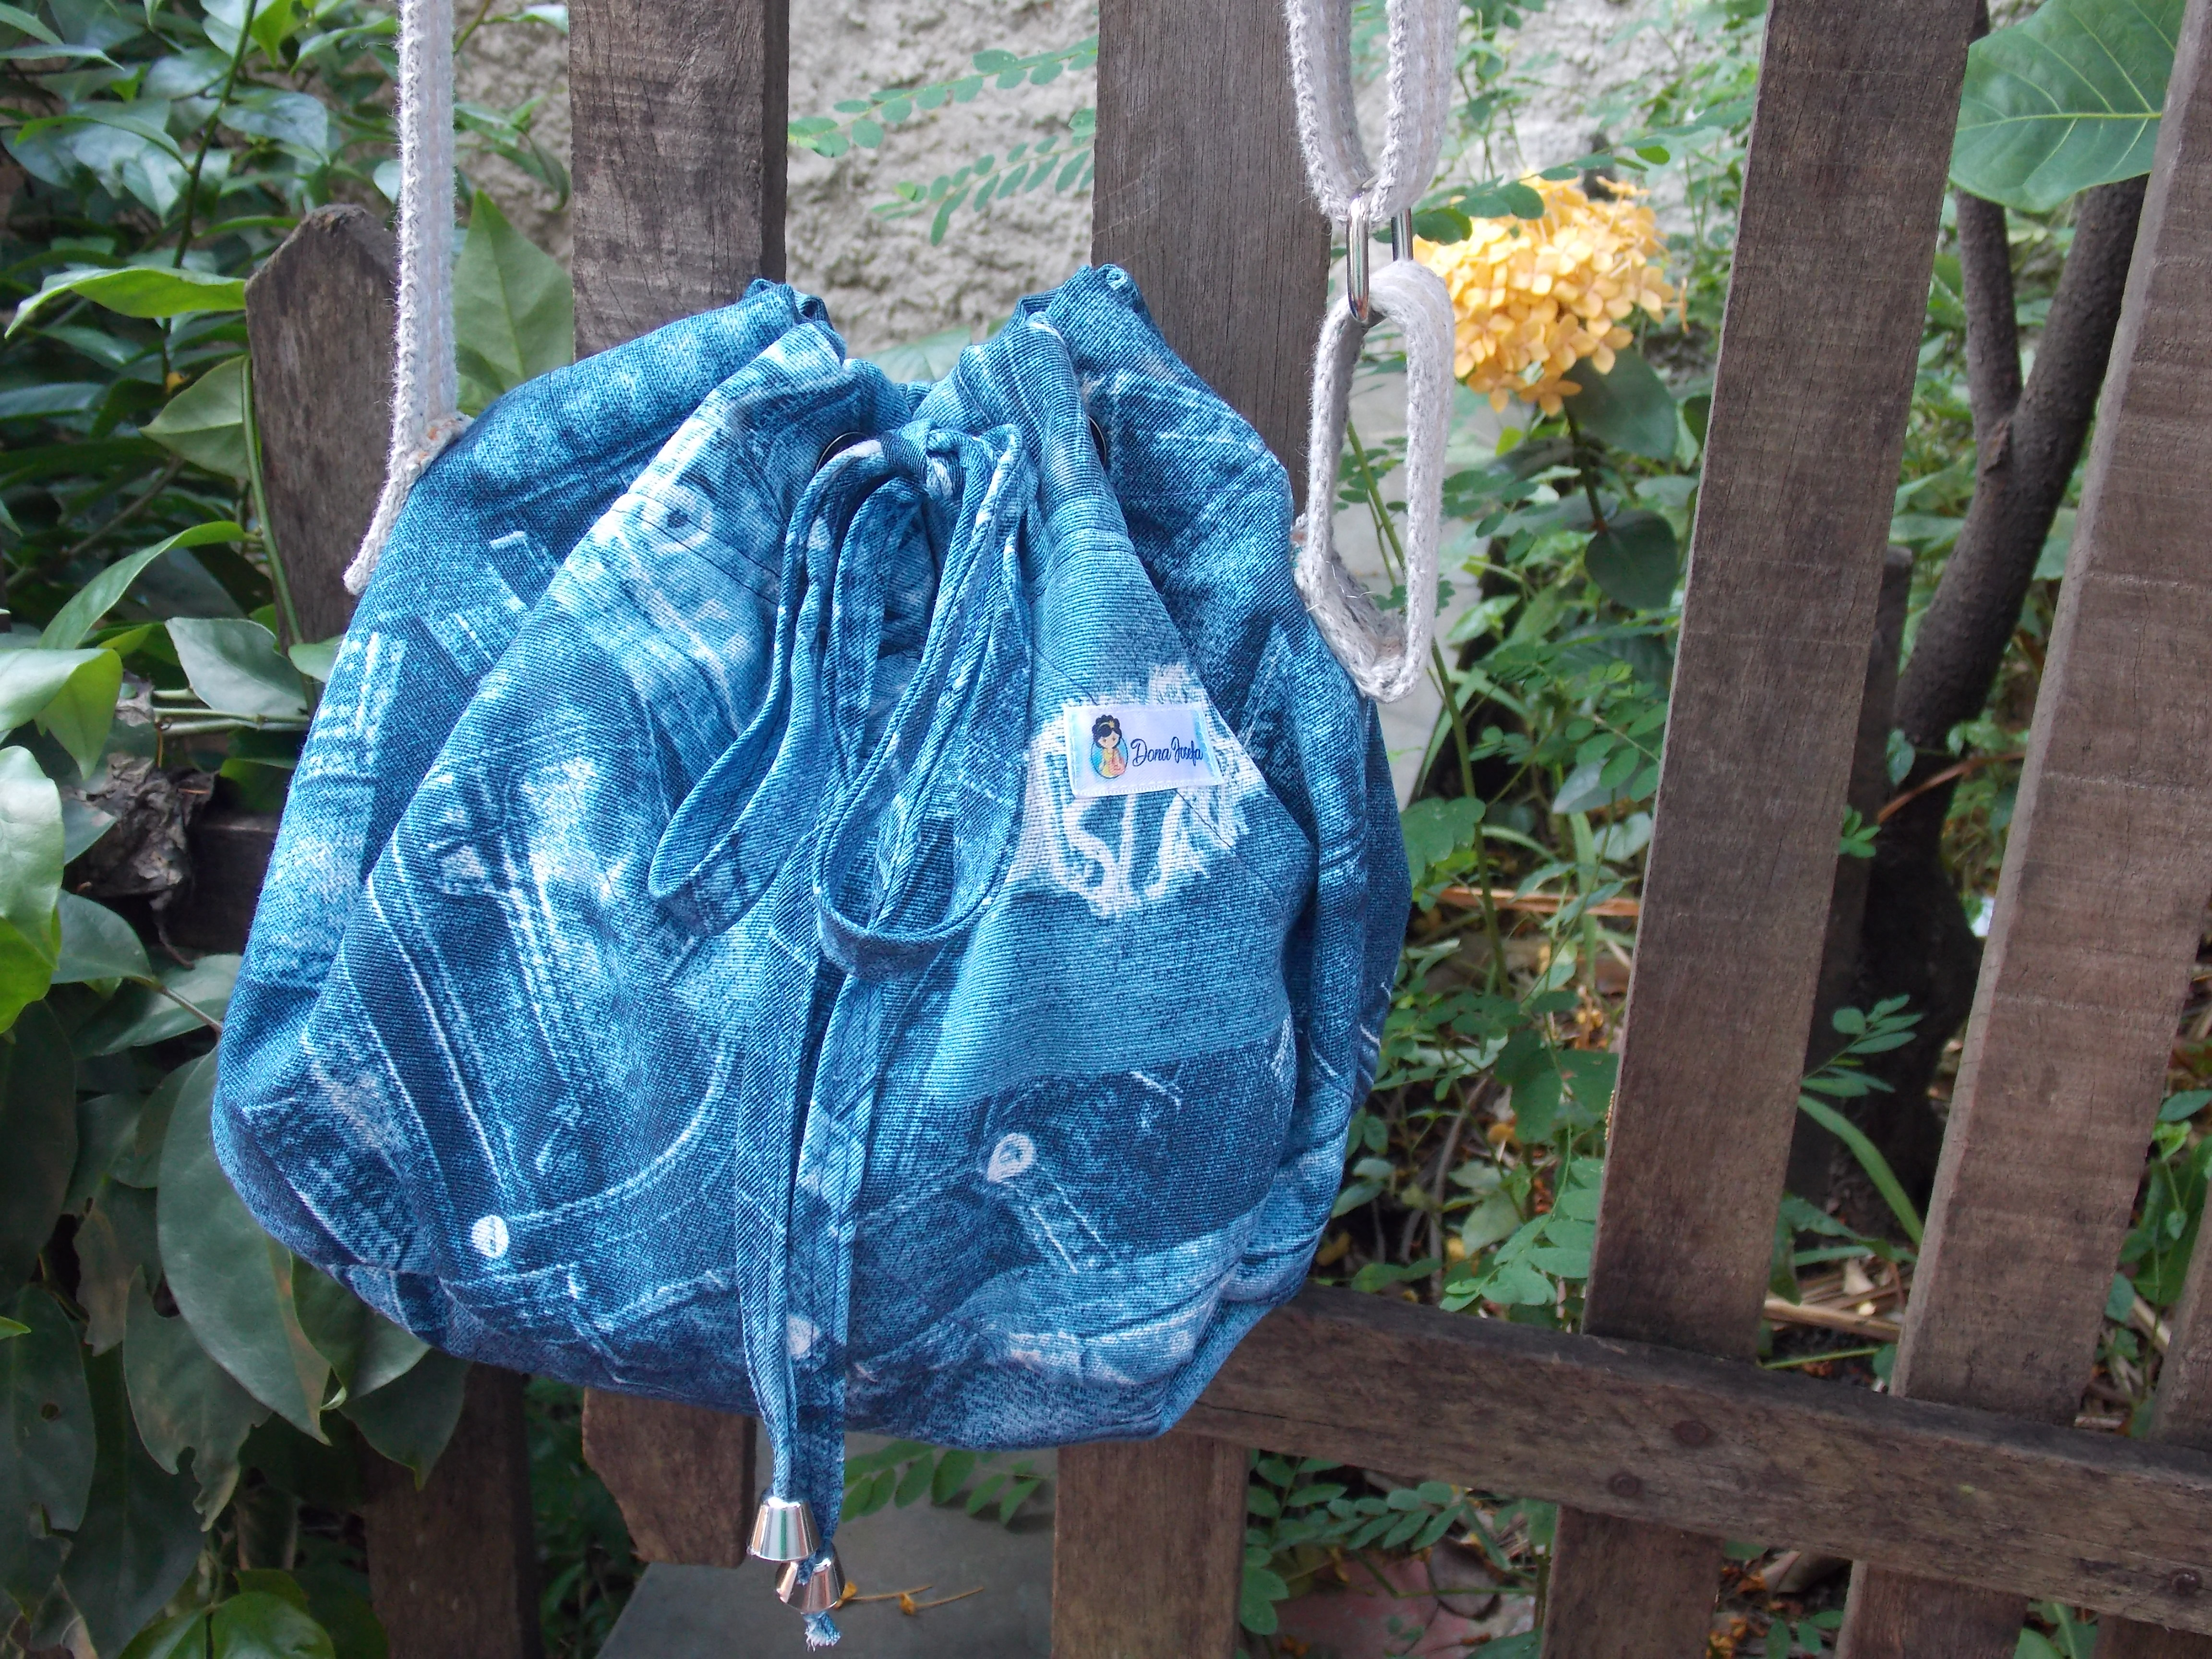 Bolsa Saco Jeans - Bucket Bag (alça cinza) no Elo7  163294d51fe